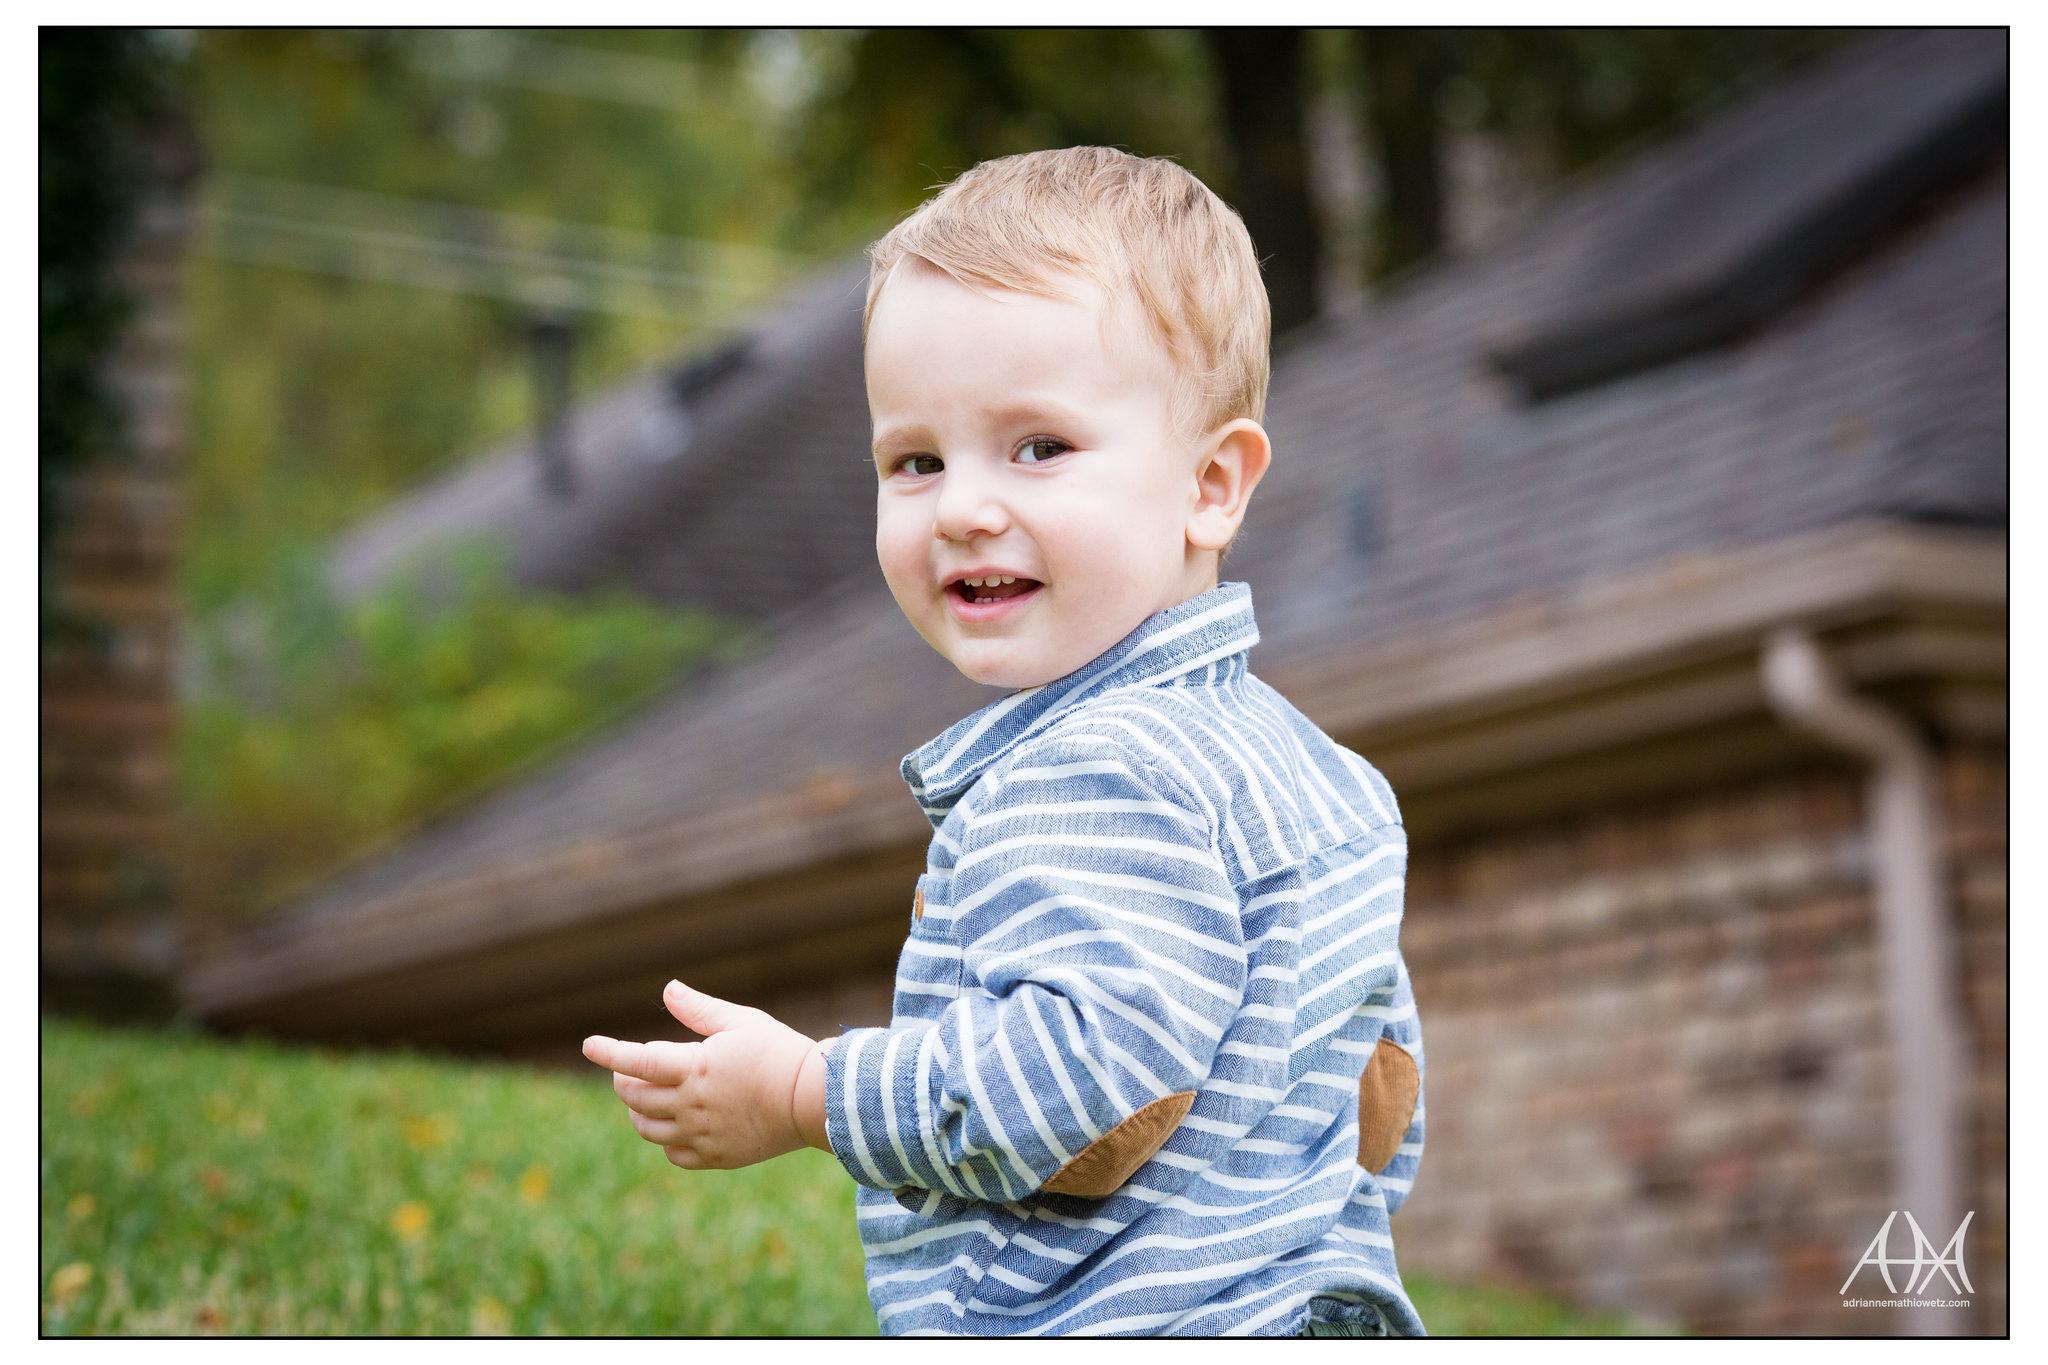 Henry on a walk - smile